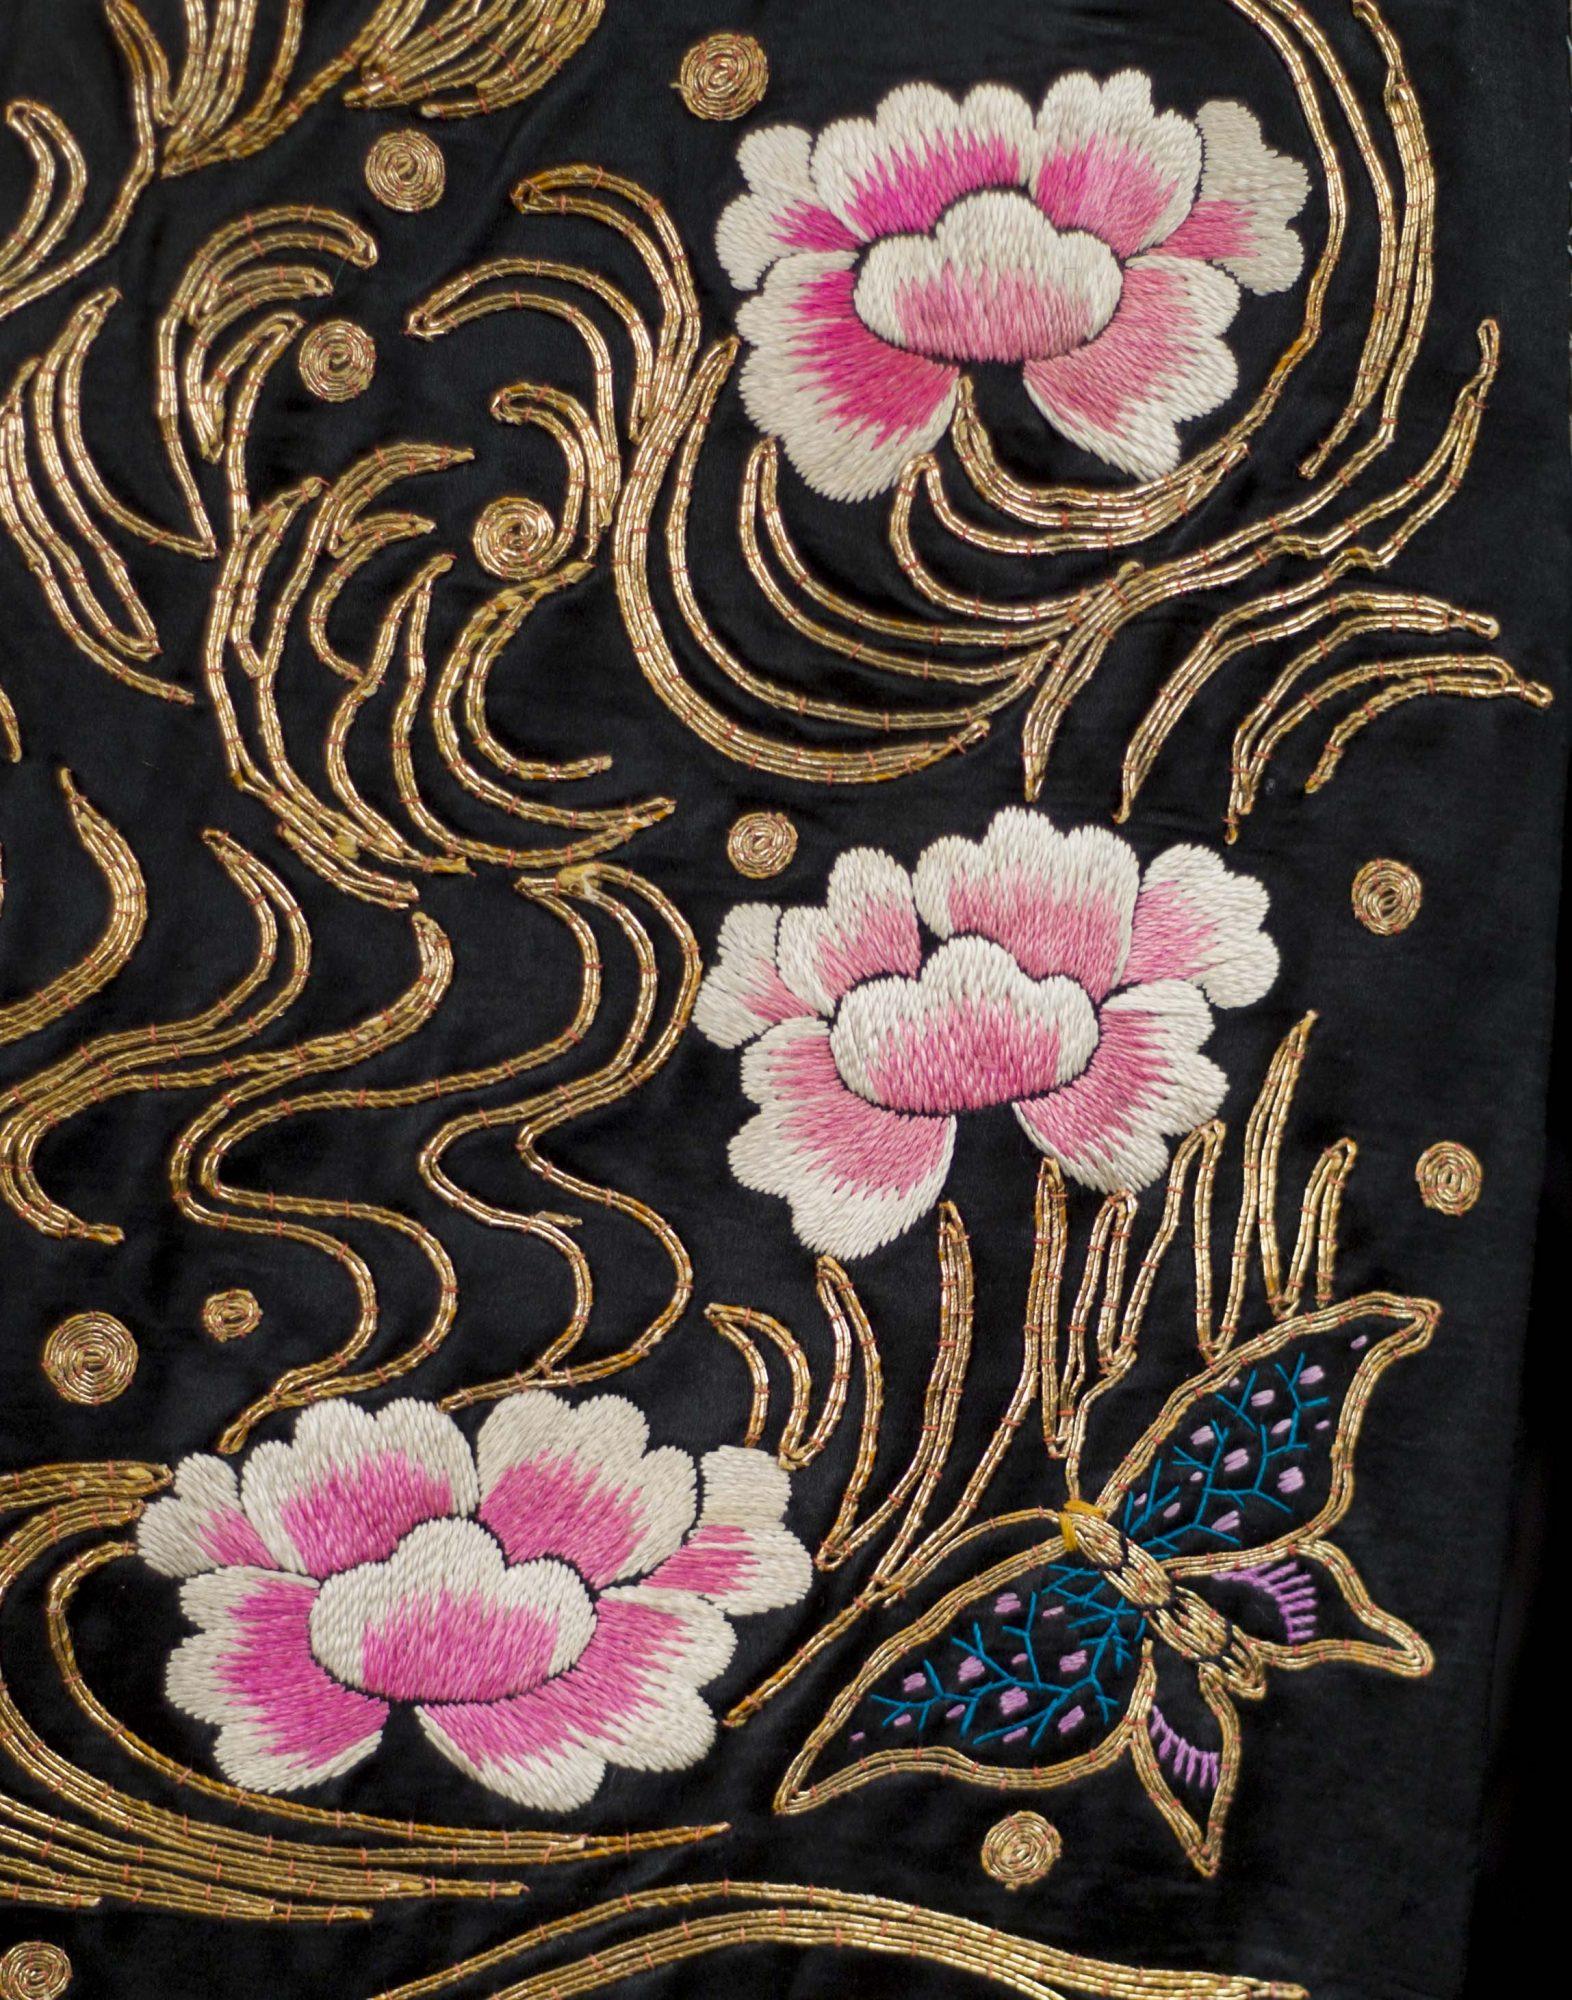 Obi, (detail), 1913. Silk satin embroidered with silk and metallic. Photo by David Dashiell.